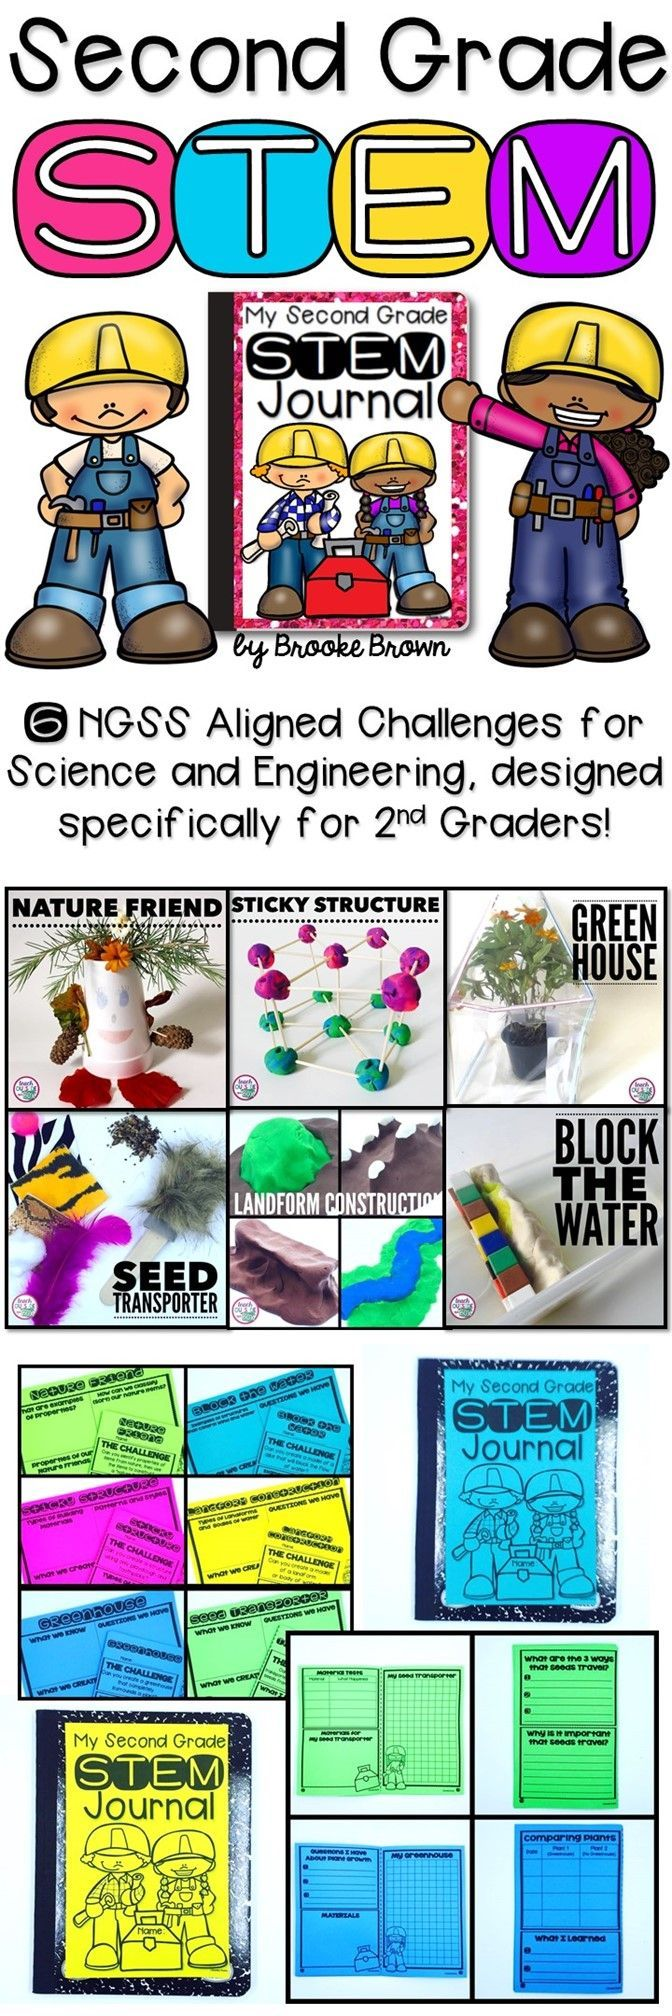 163189 best tpt science lessons images on pinterest science classroom science lessons and. Black Bedroom Furniture Sets. Home Design Ideas